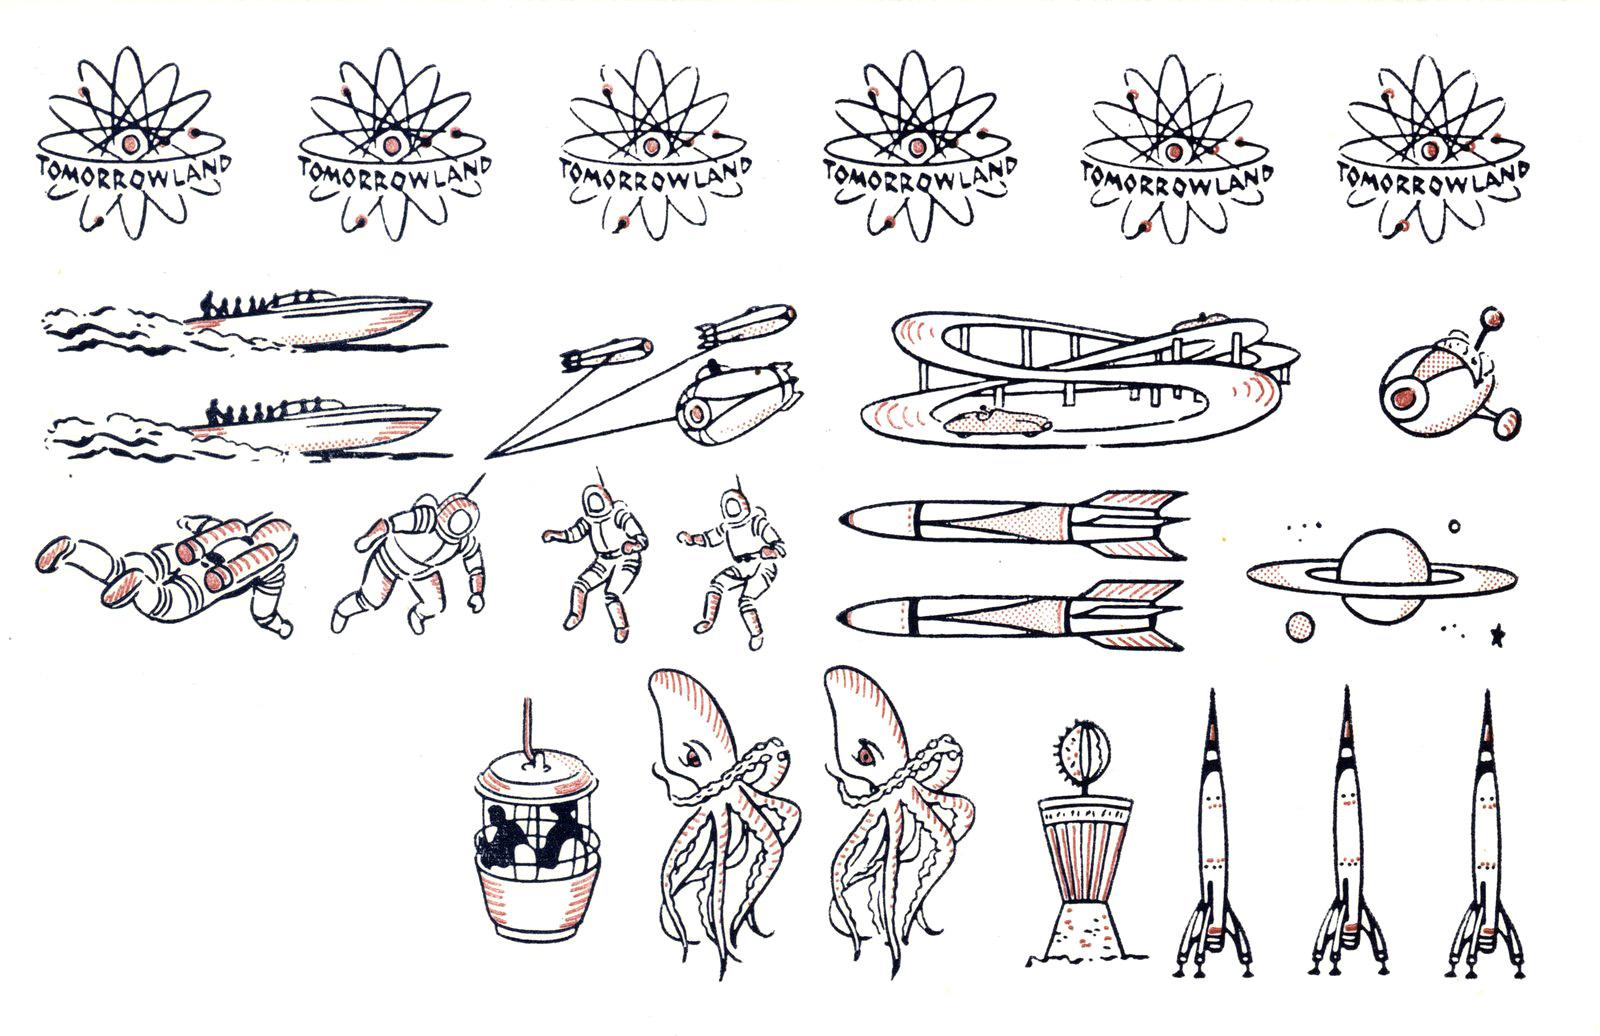 Disneyland Tattoos